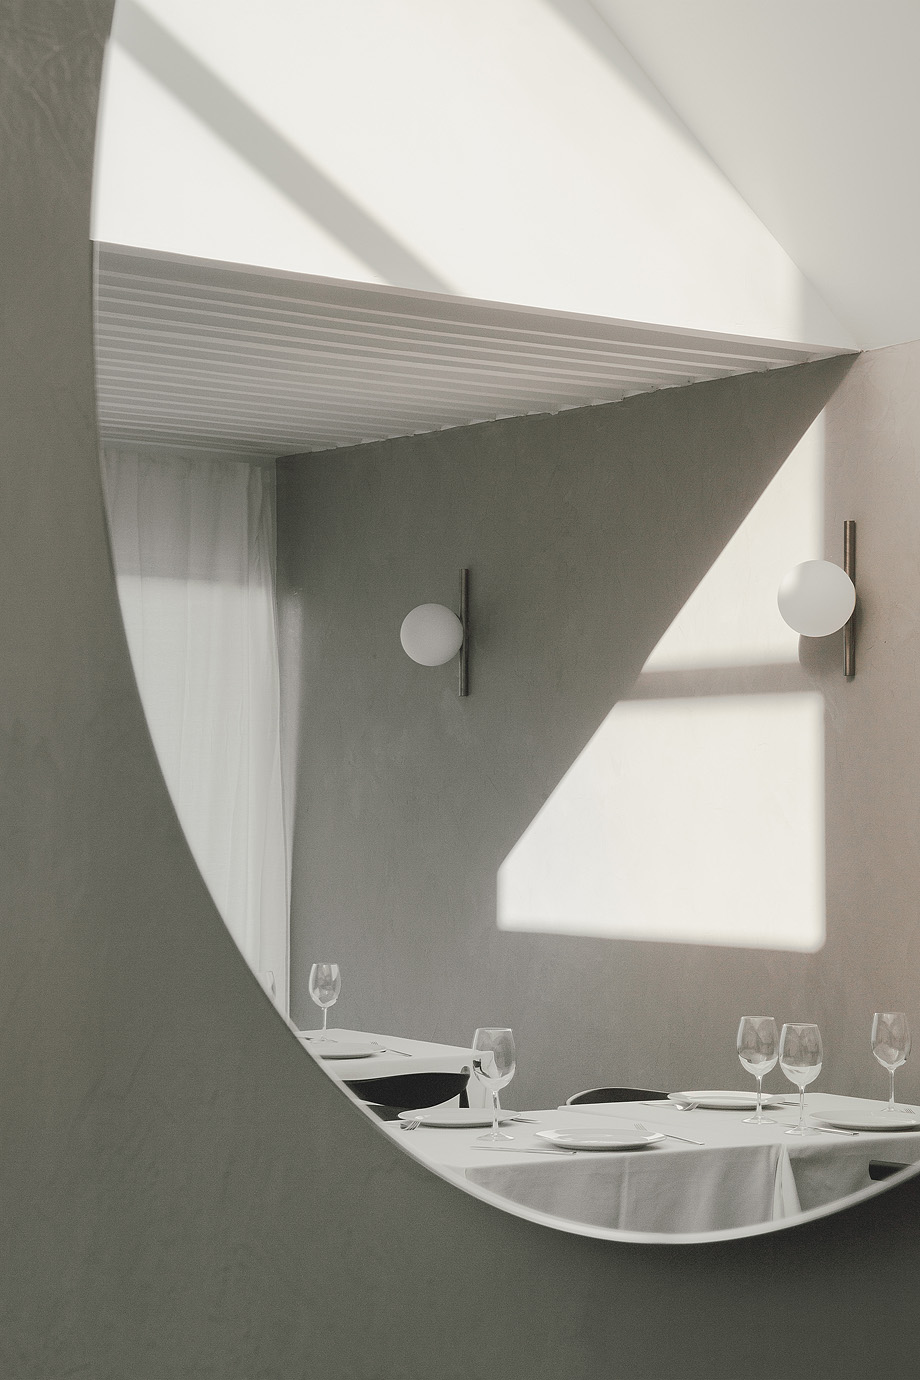 restaurante raco de l'arnau de carles segarra - foto - david zarzoso (6)